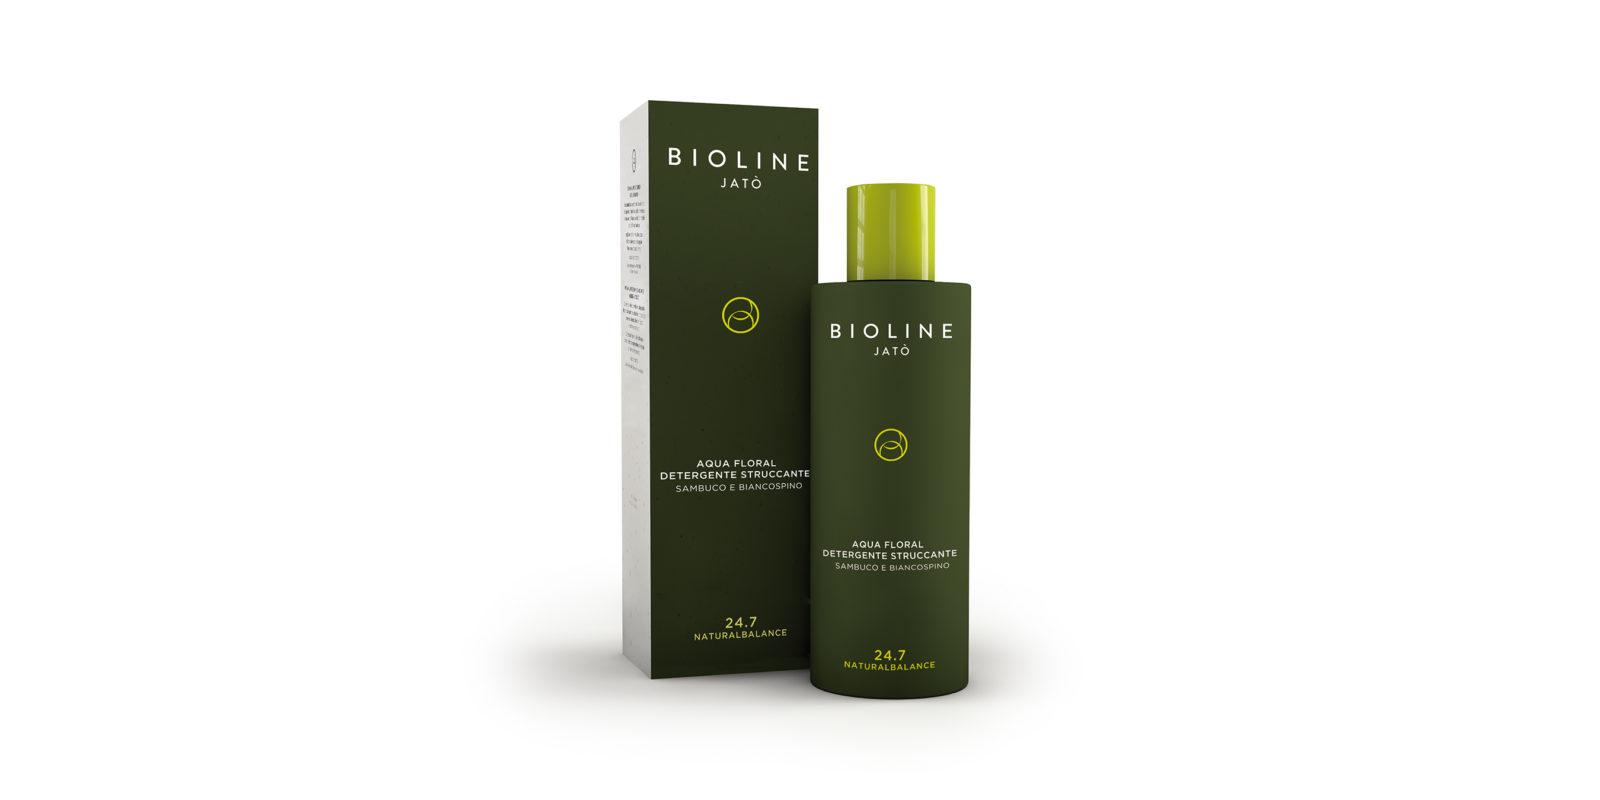 Aqua Floral detergente struccante Linea Naturalbalance - Bioline Jatò